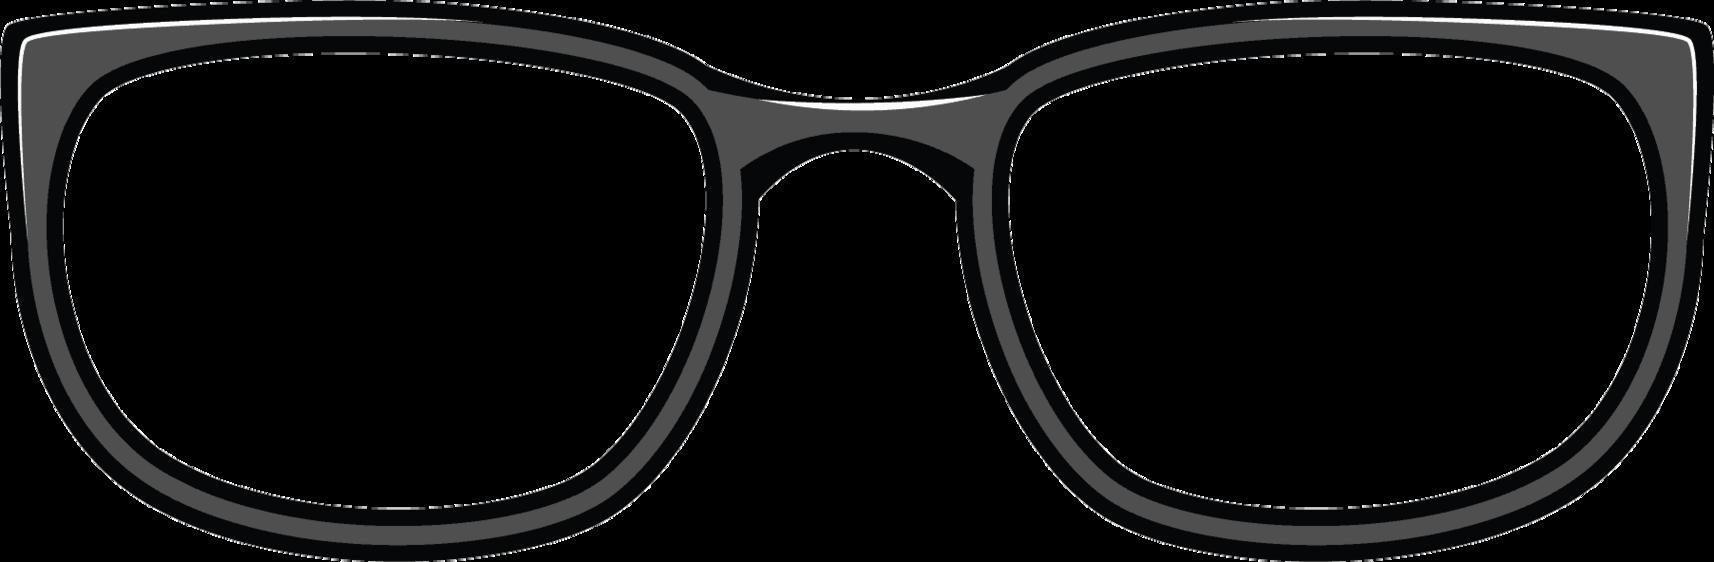 Glasses images clip art clipartfox